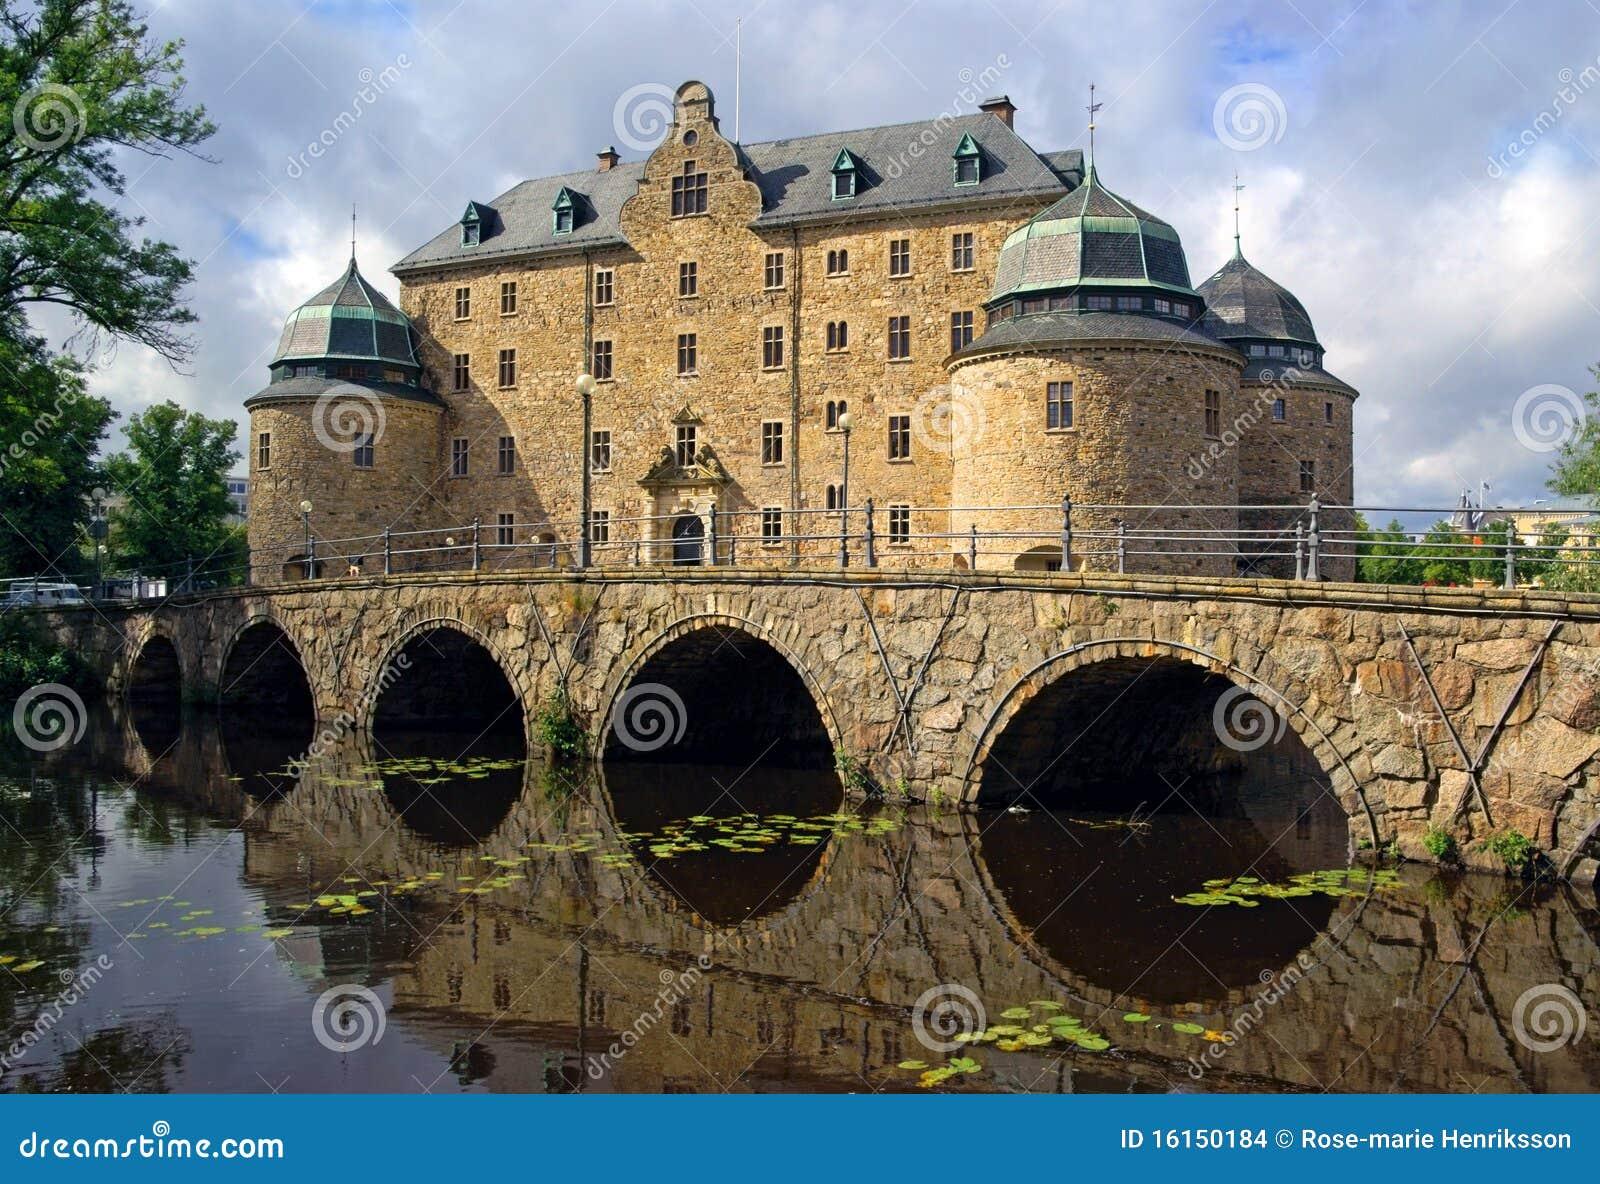 Slottorebro sweden